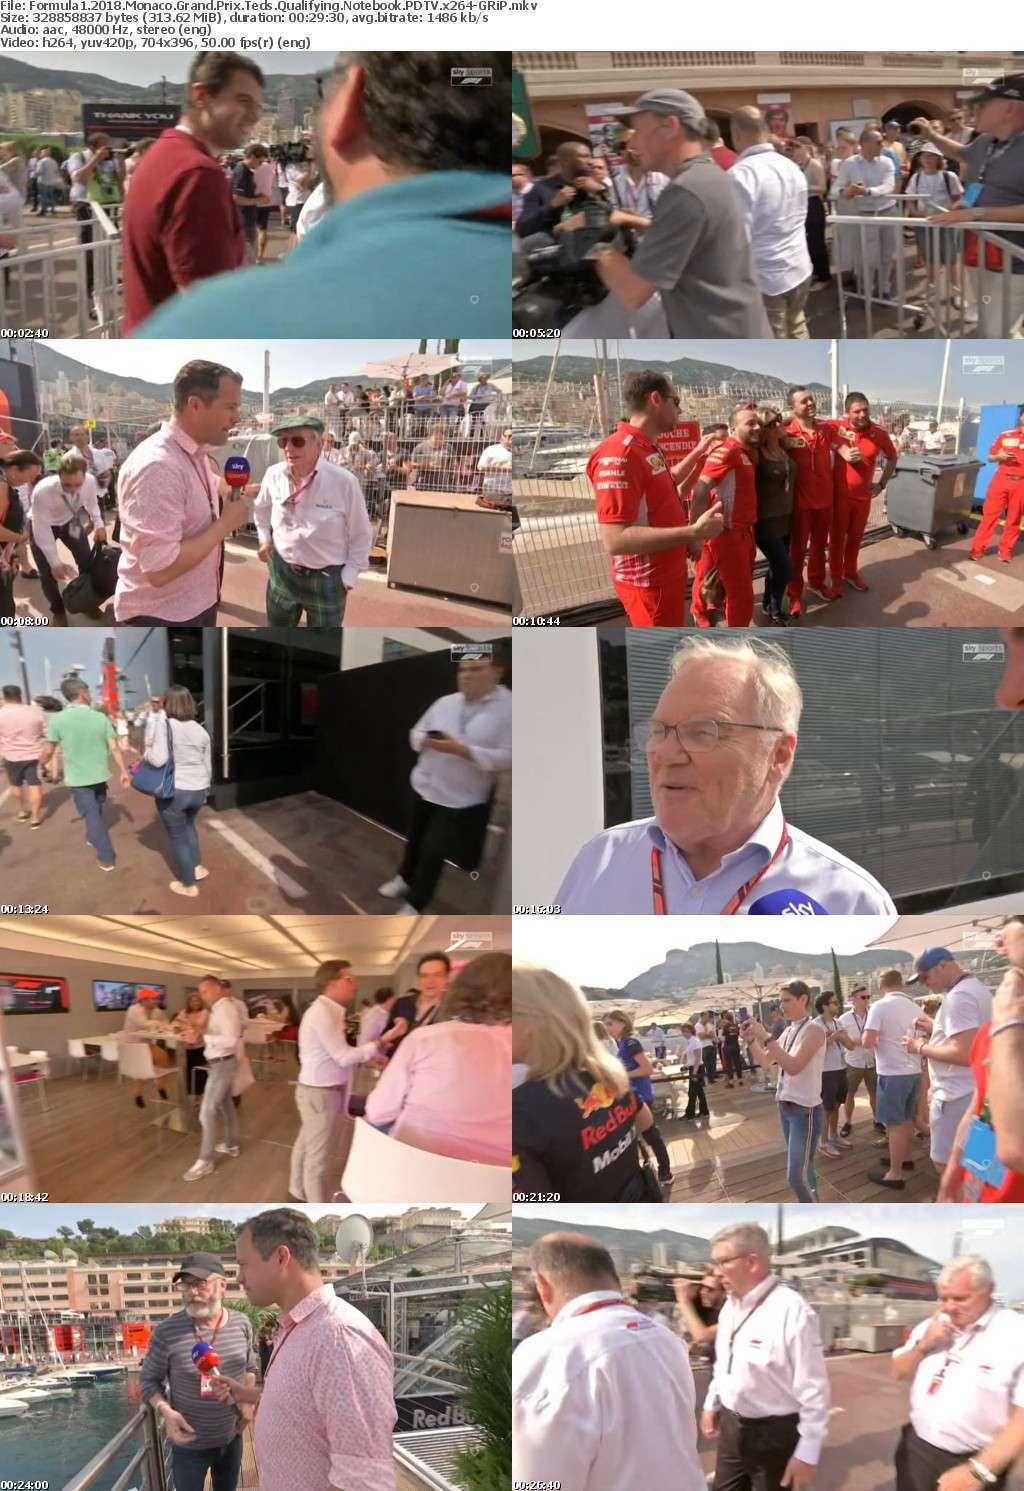 Formula1 2018 Monaco Grand Prix Teds Qualifying Notebook PDTV x264-GRiP